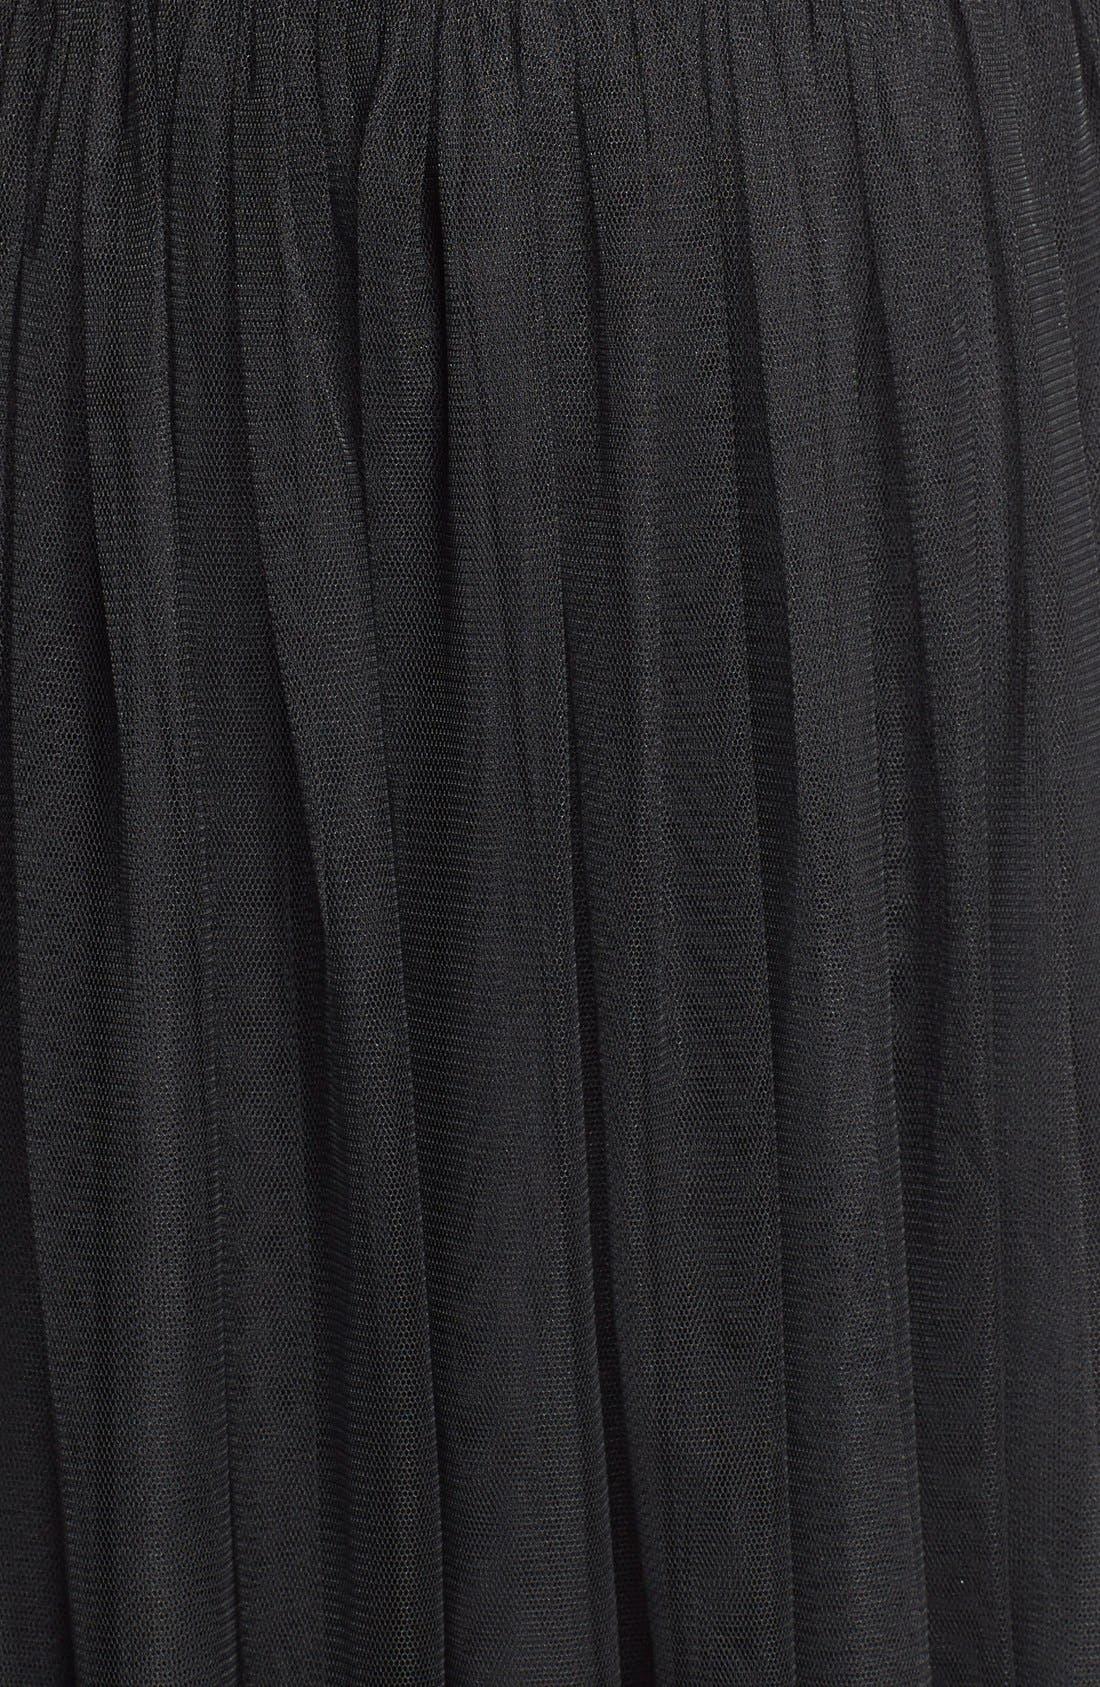 Alternate Image 3  - En Crème Embellished Cutout Fit & Flare Dress (Juniors)